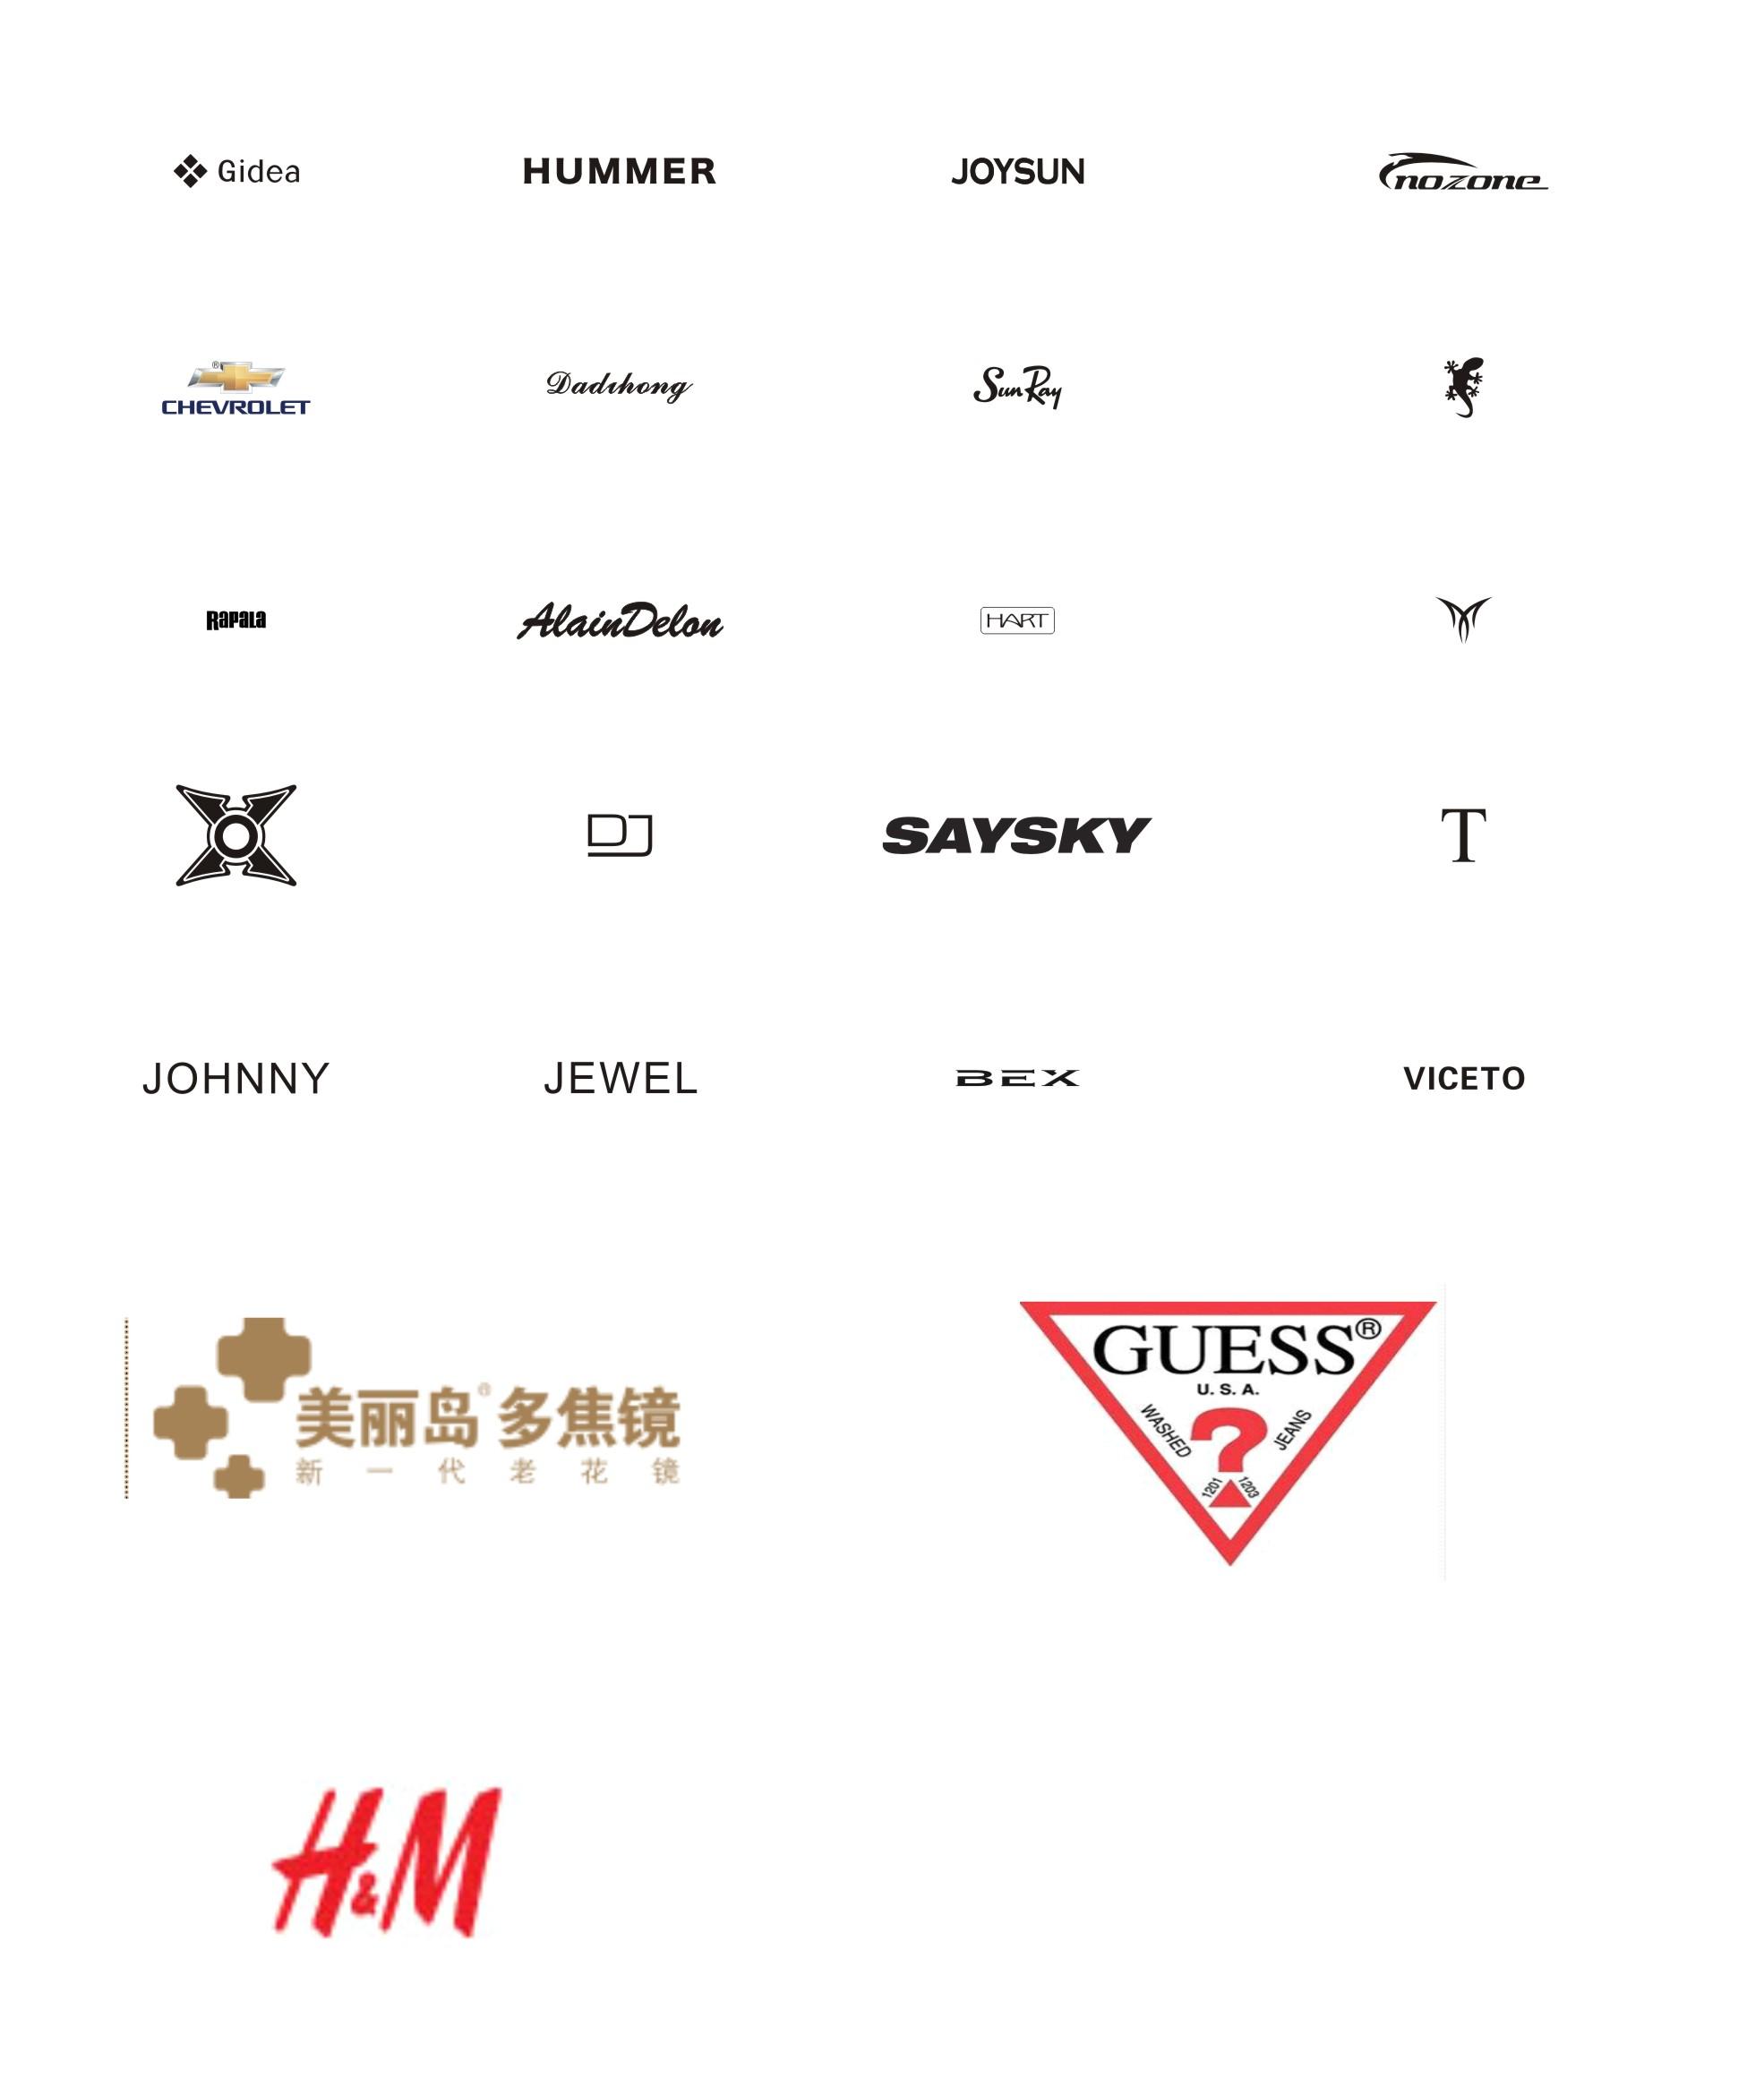 Cooperating Brands